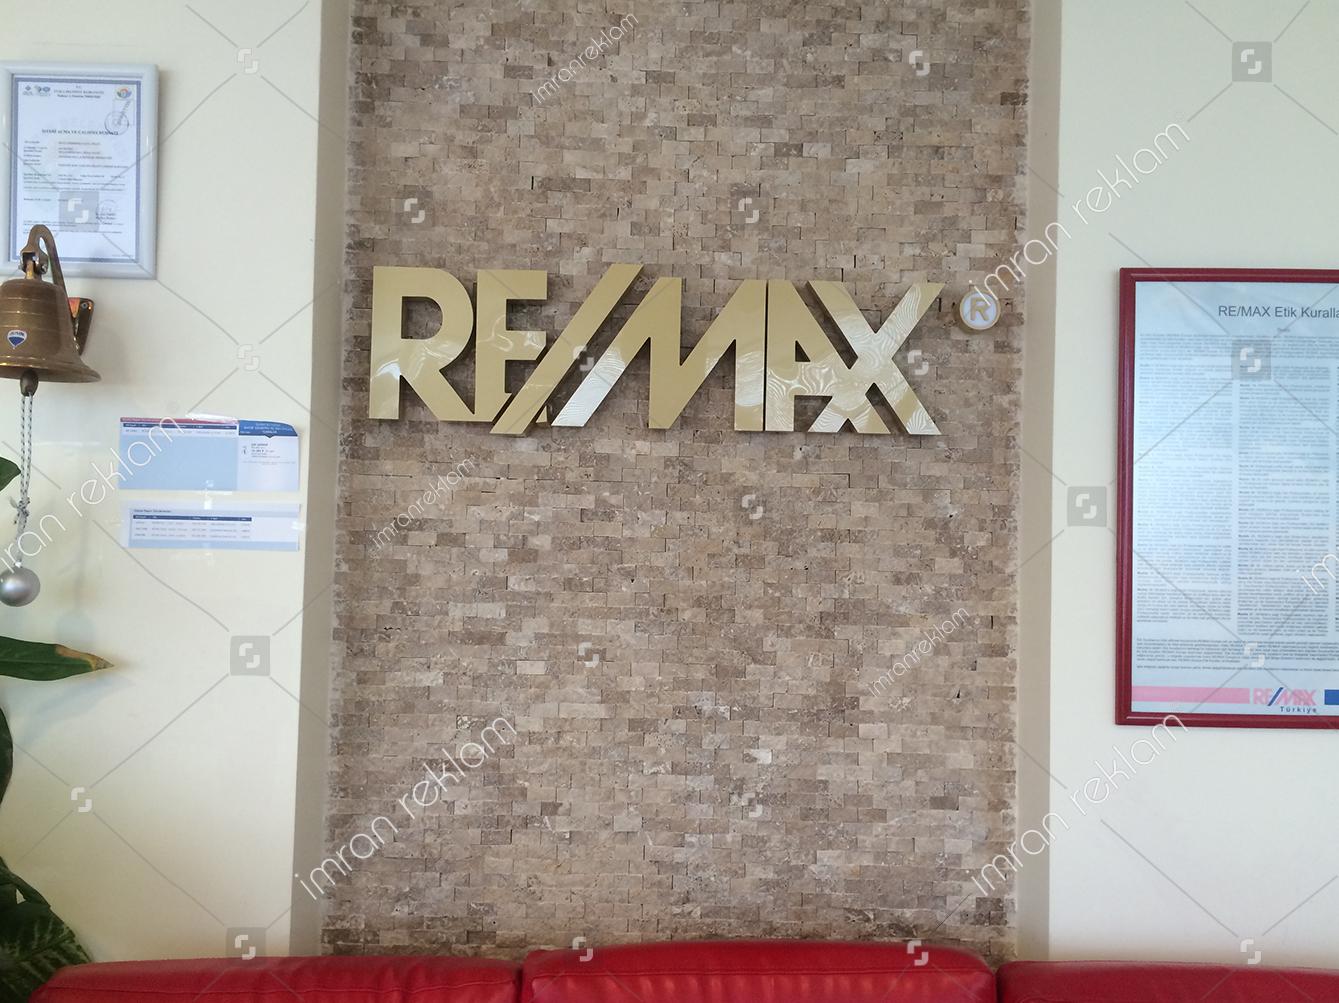 remax-krom-kutu-harfli-banko-tabelasi